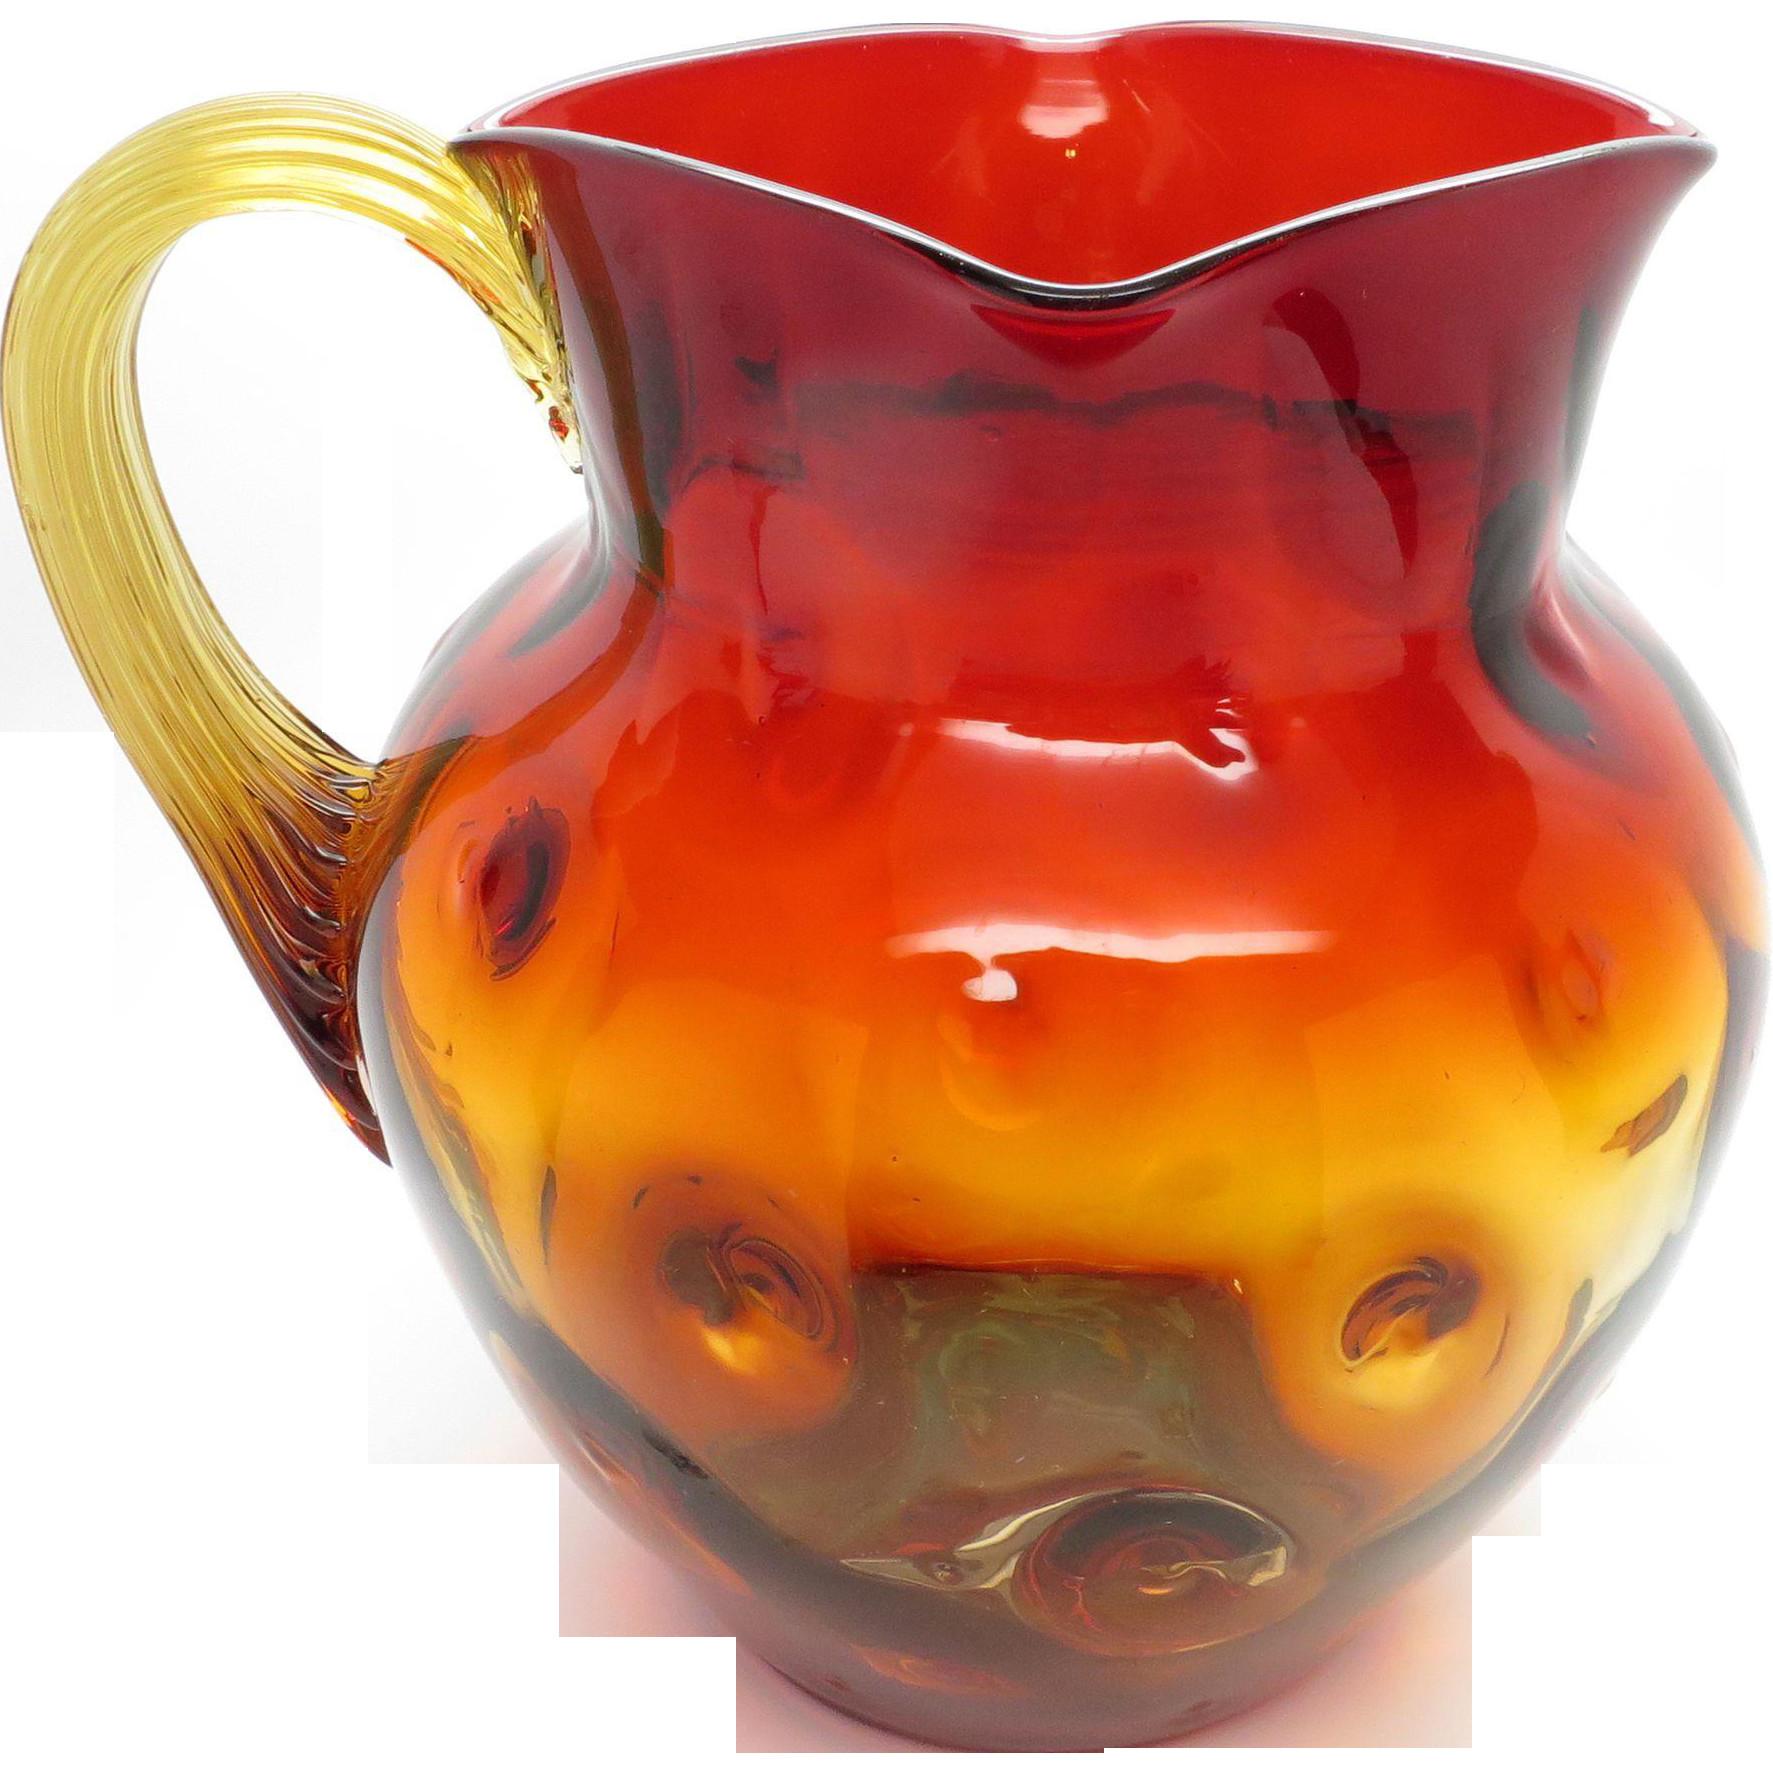 glass pitcher vase of beautiful antique new england thumbprint amberina art glass pitcher regarding beautiful antique new england thumbprint amberina art glass pitcher with square mouth applied reeded handle www rubylane com rubylanecom